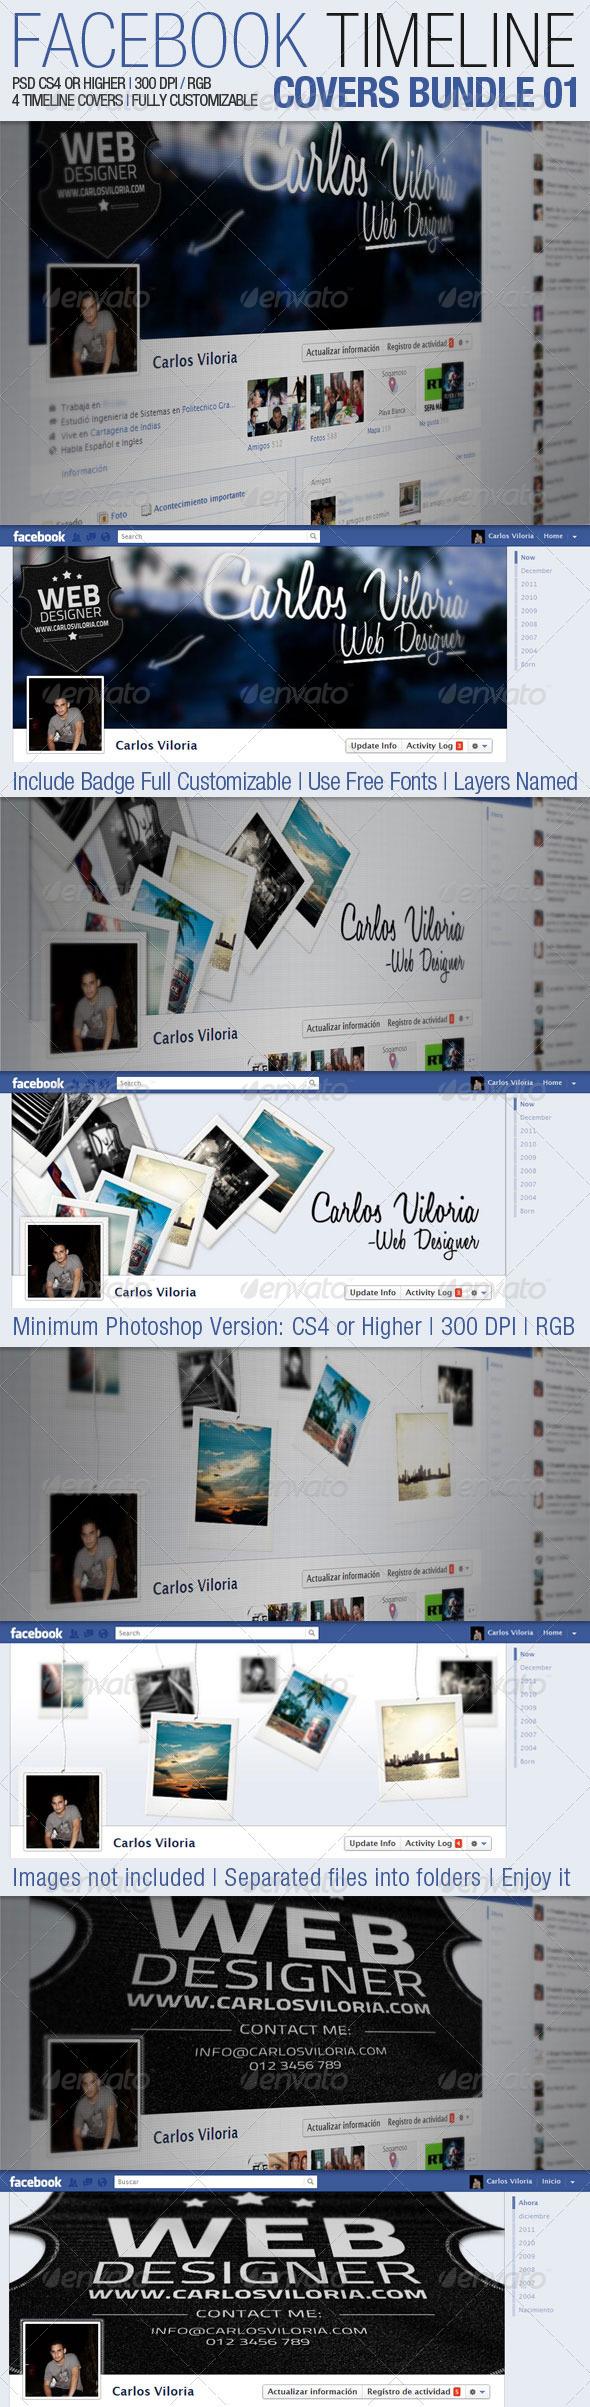 GraphicRiver Facebook Timeline Covers Bundle 01 1791297